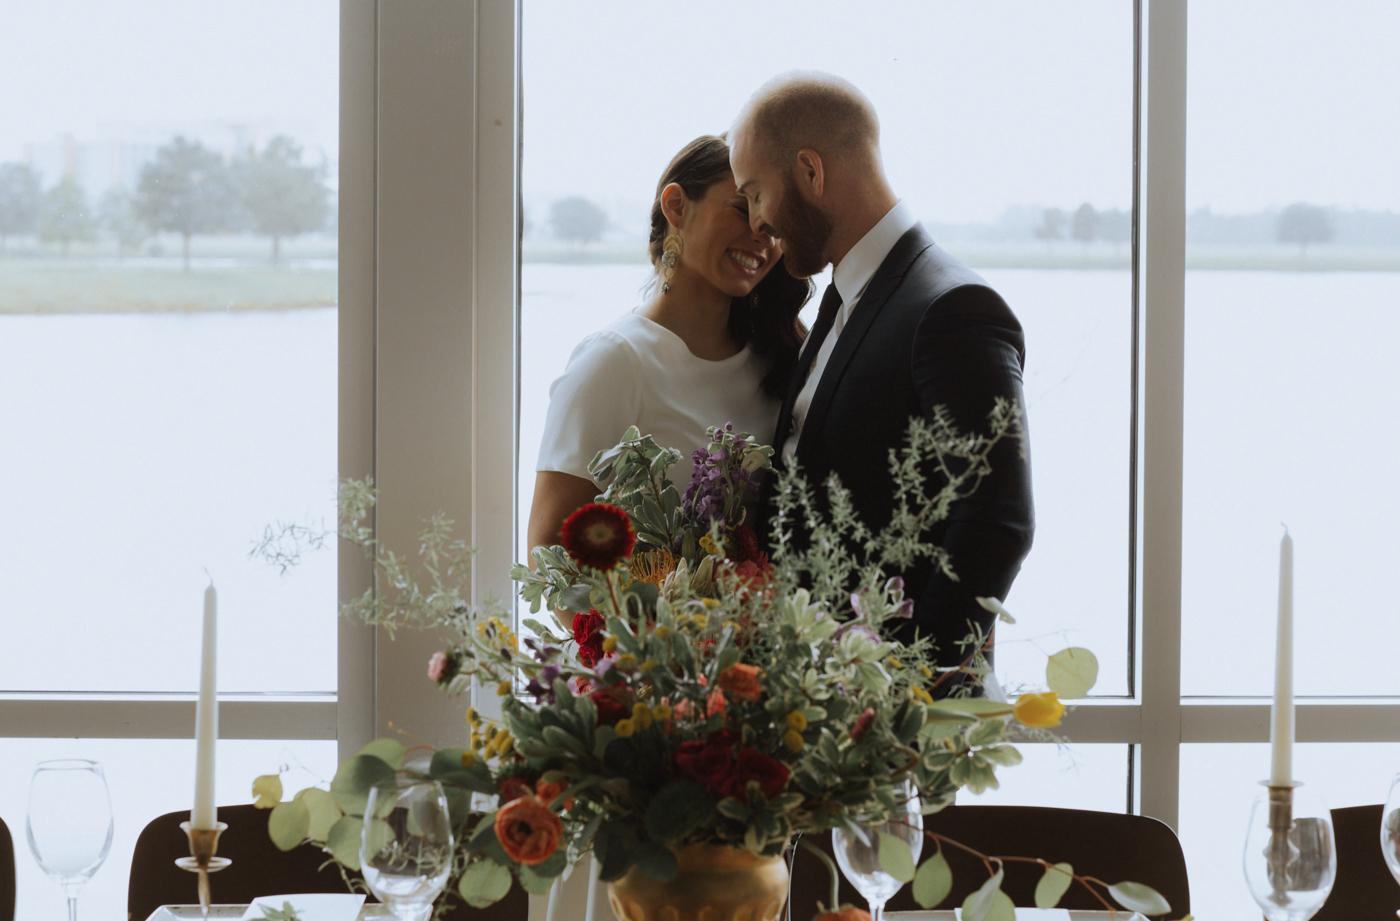 Wedding | Canvas Market | Lake Nona-Orlando, FL  | Vanessa Boy Photography | vanessaboy.com-182.com |Green Wedding Shoes.jpg